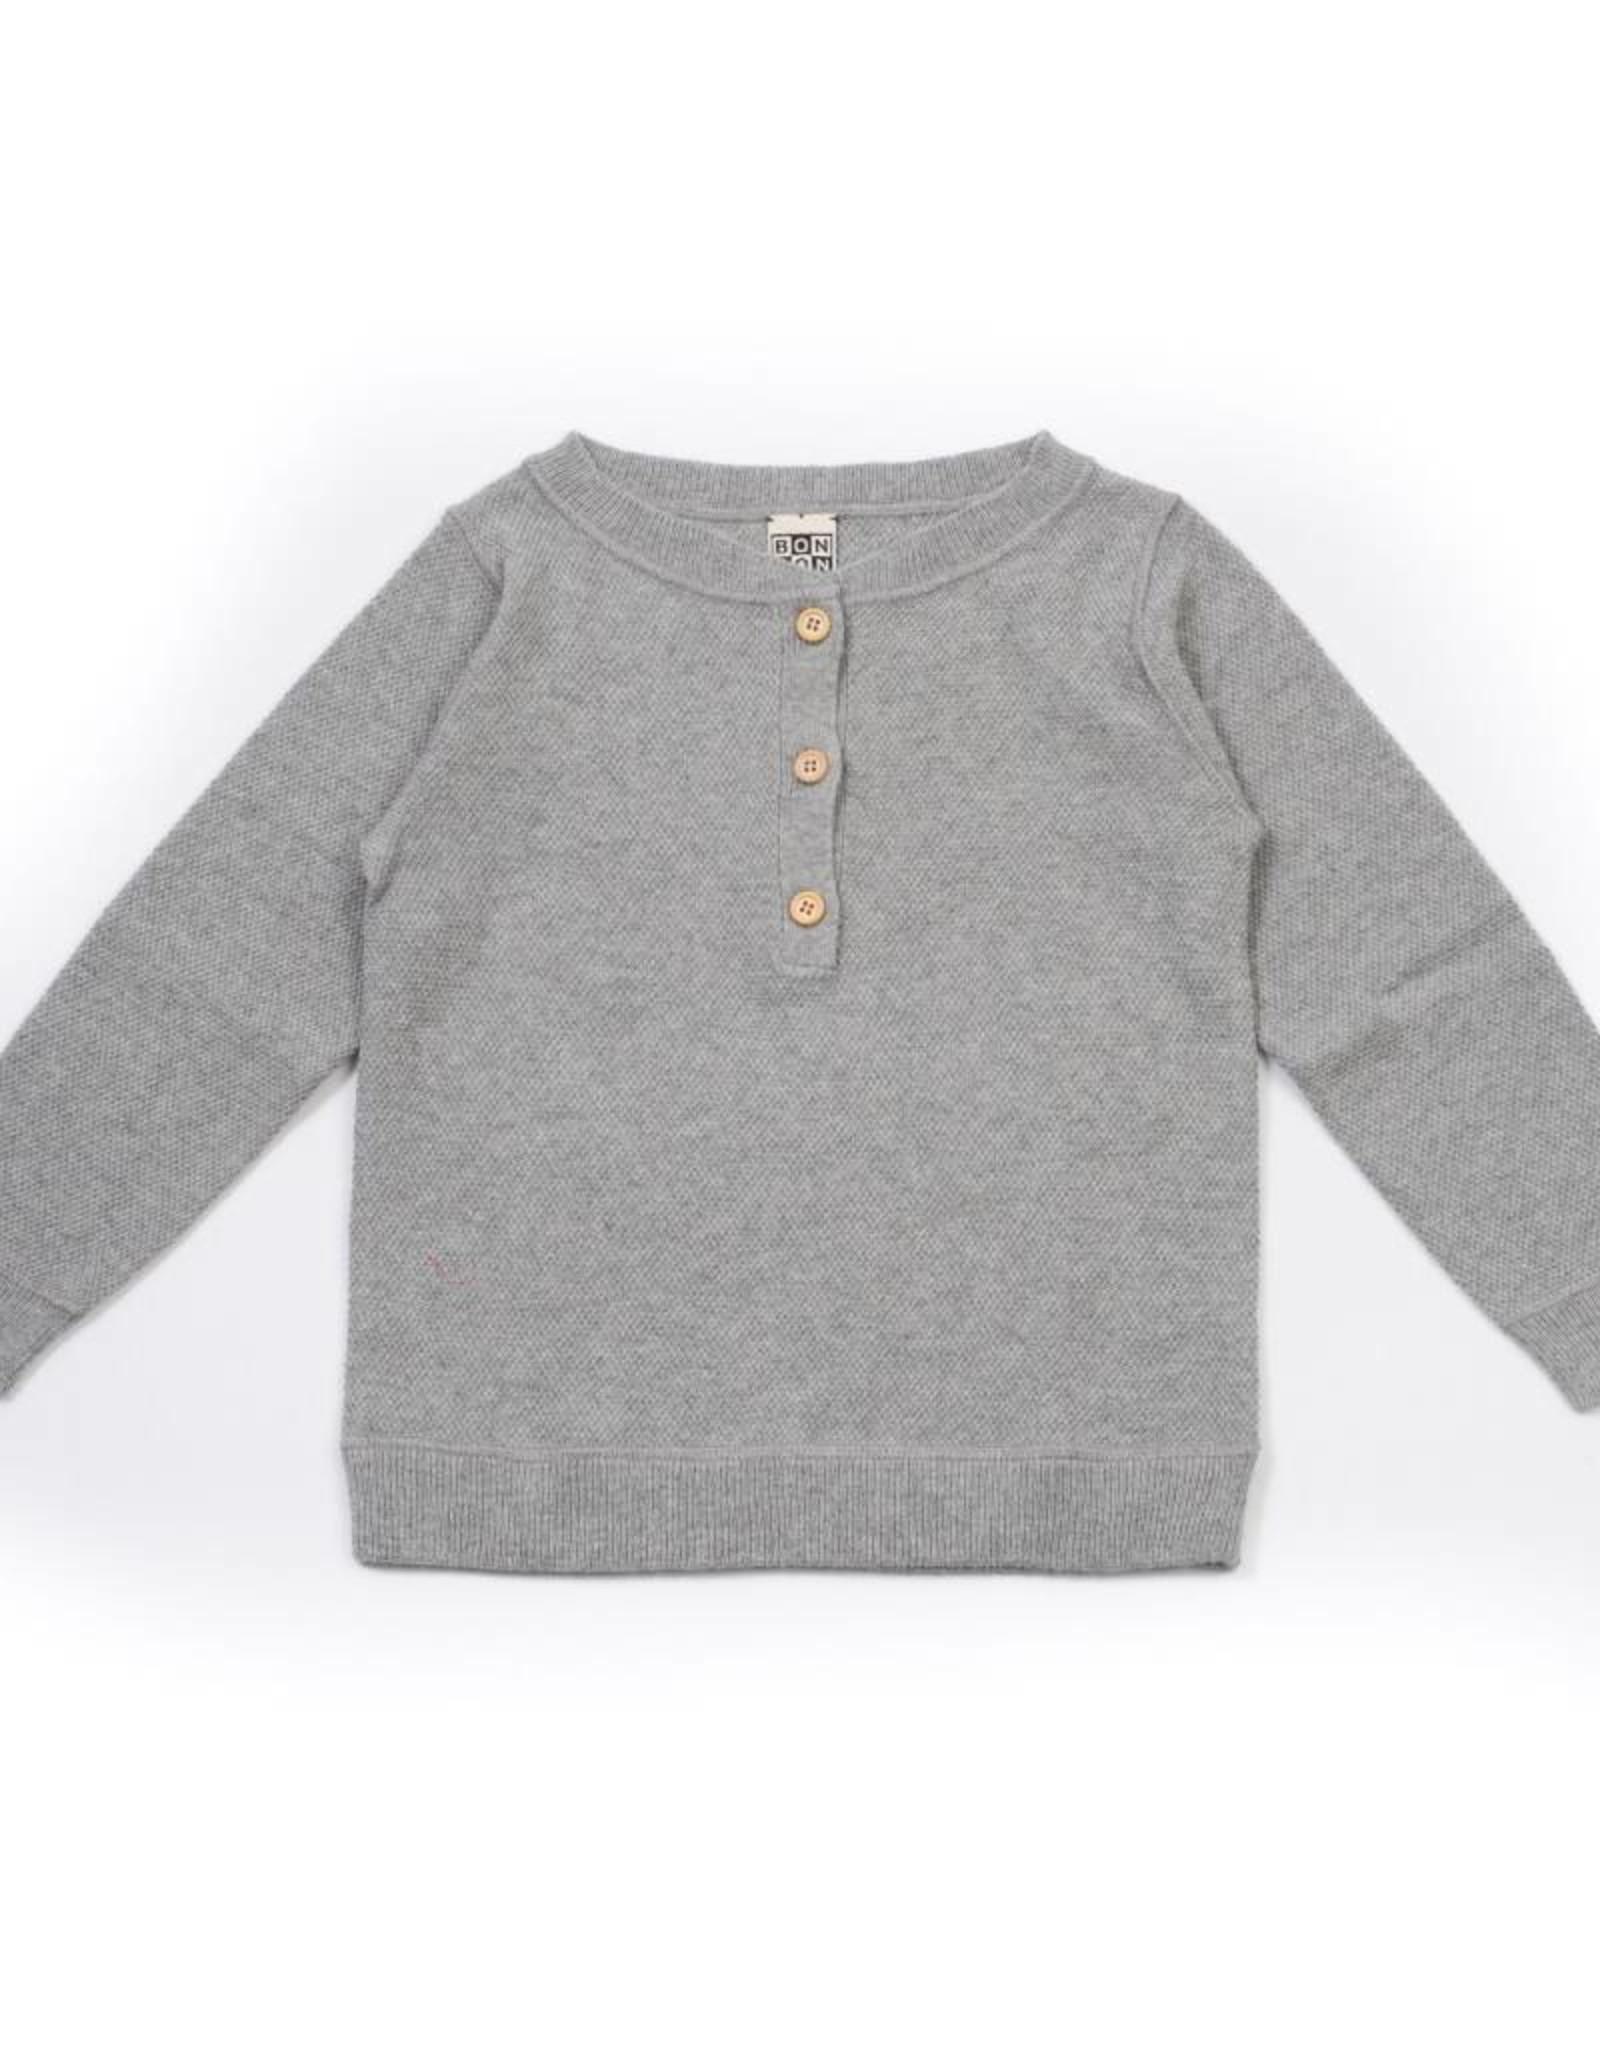 Bonton Buttons sweater